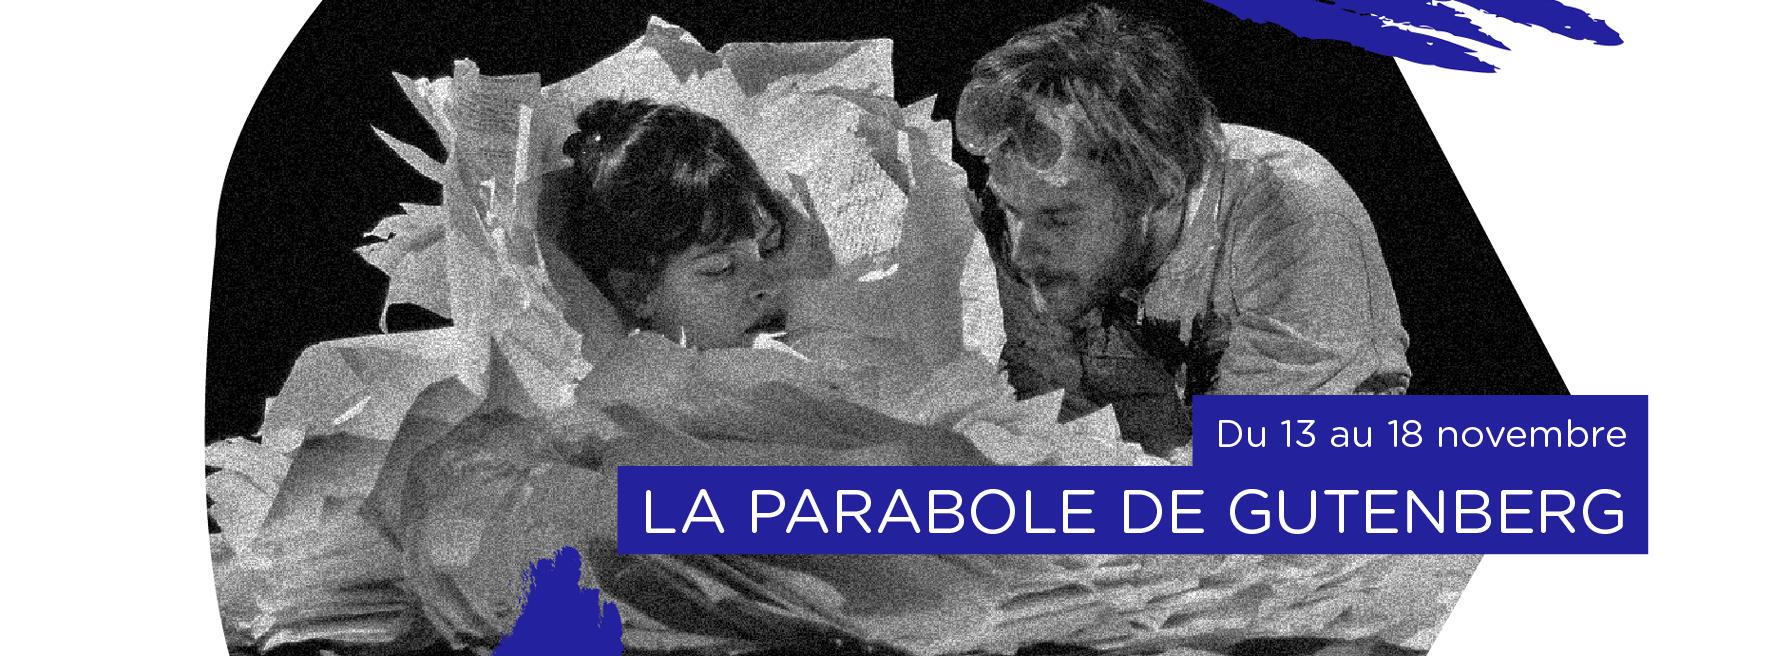 La Parabole de Gutenberg